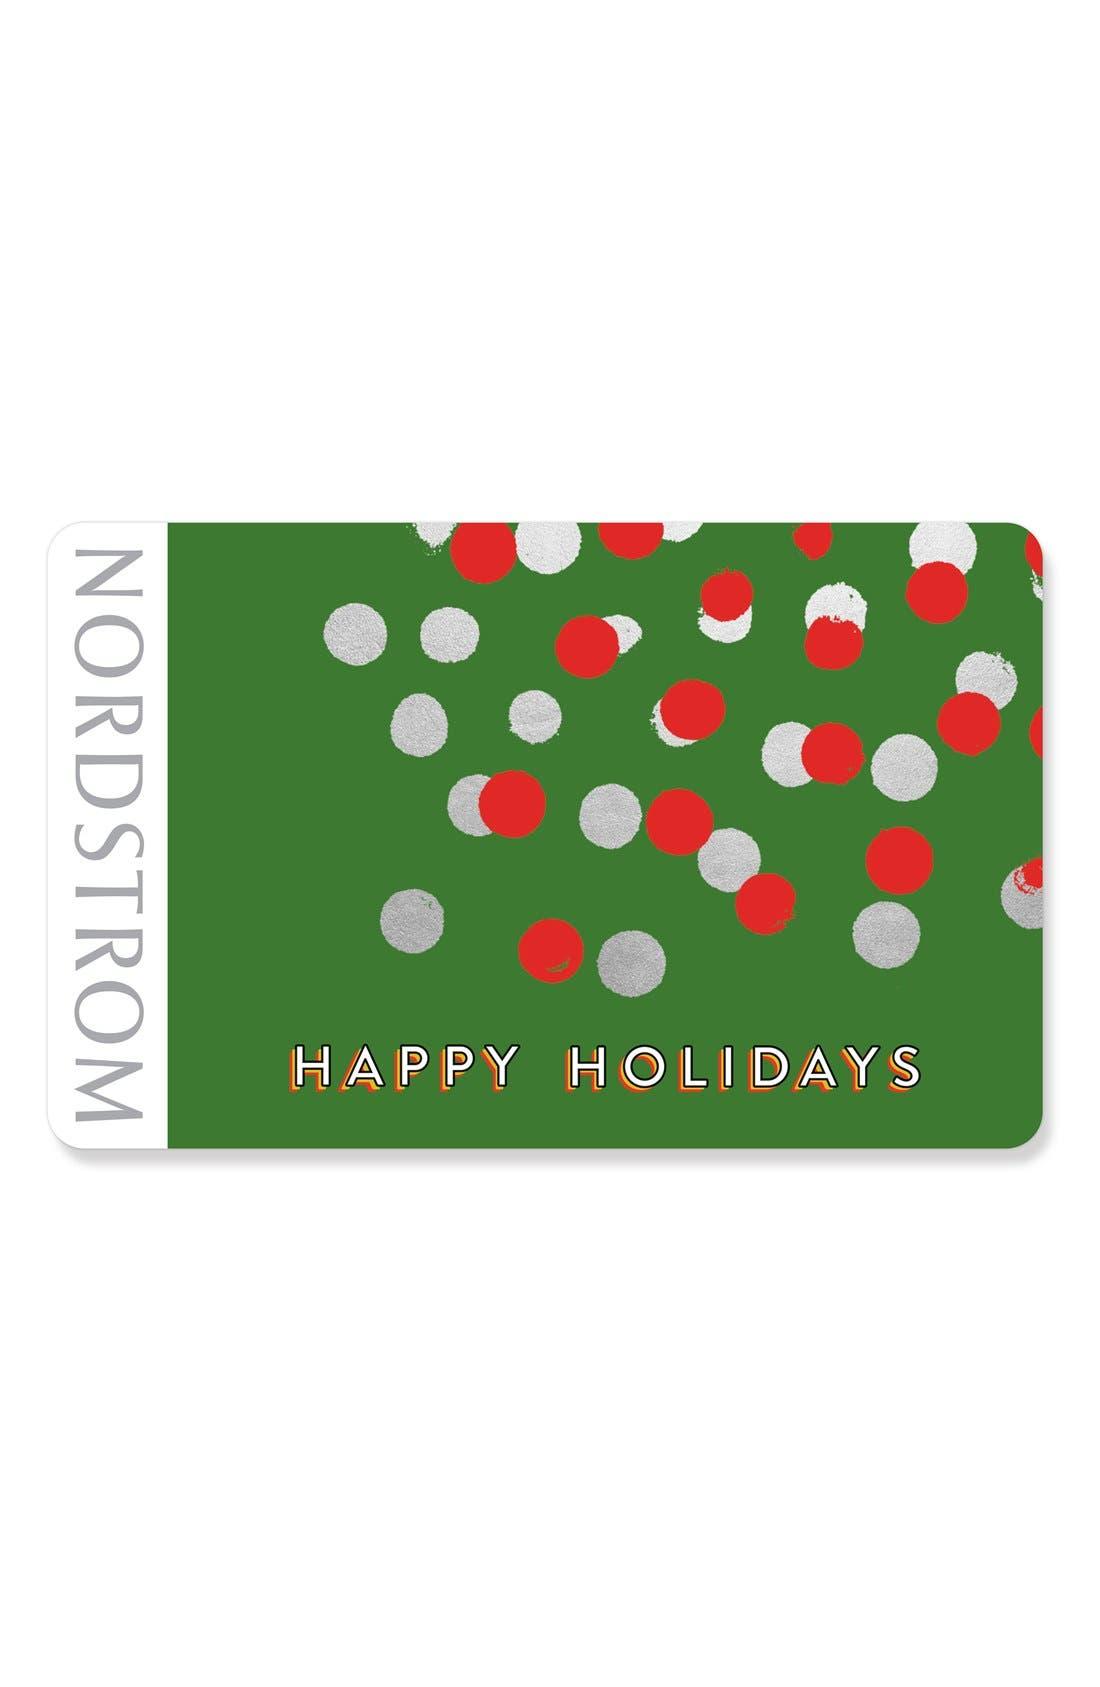 nordstrom gift certificate | Nordstrom